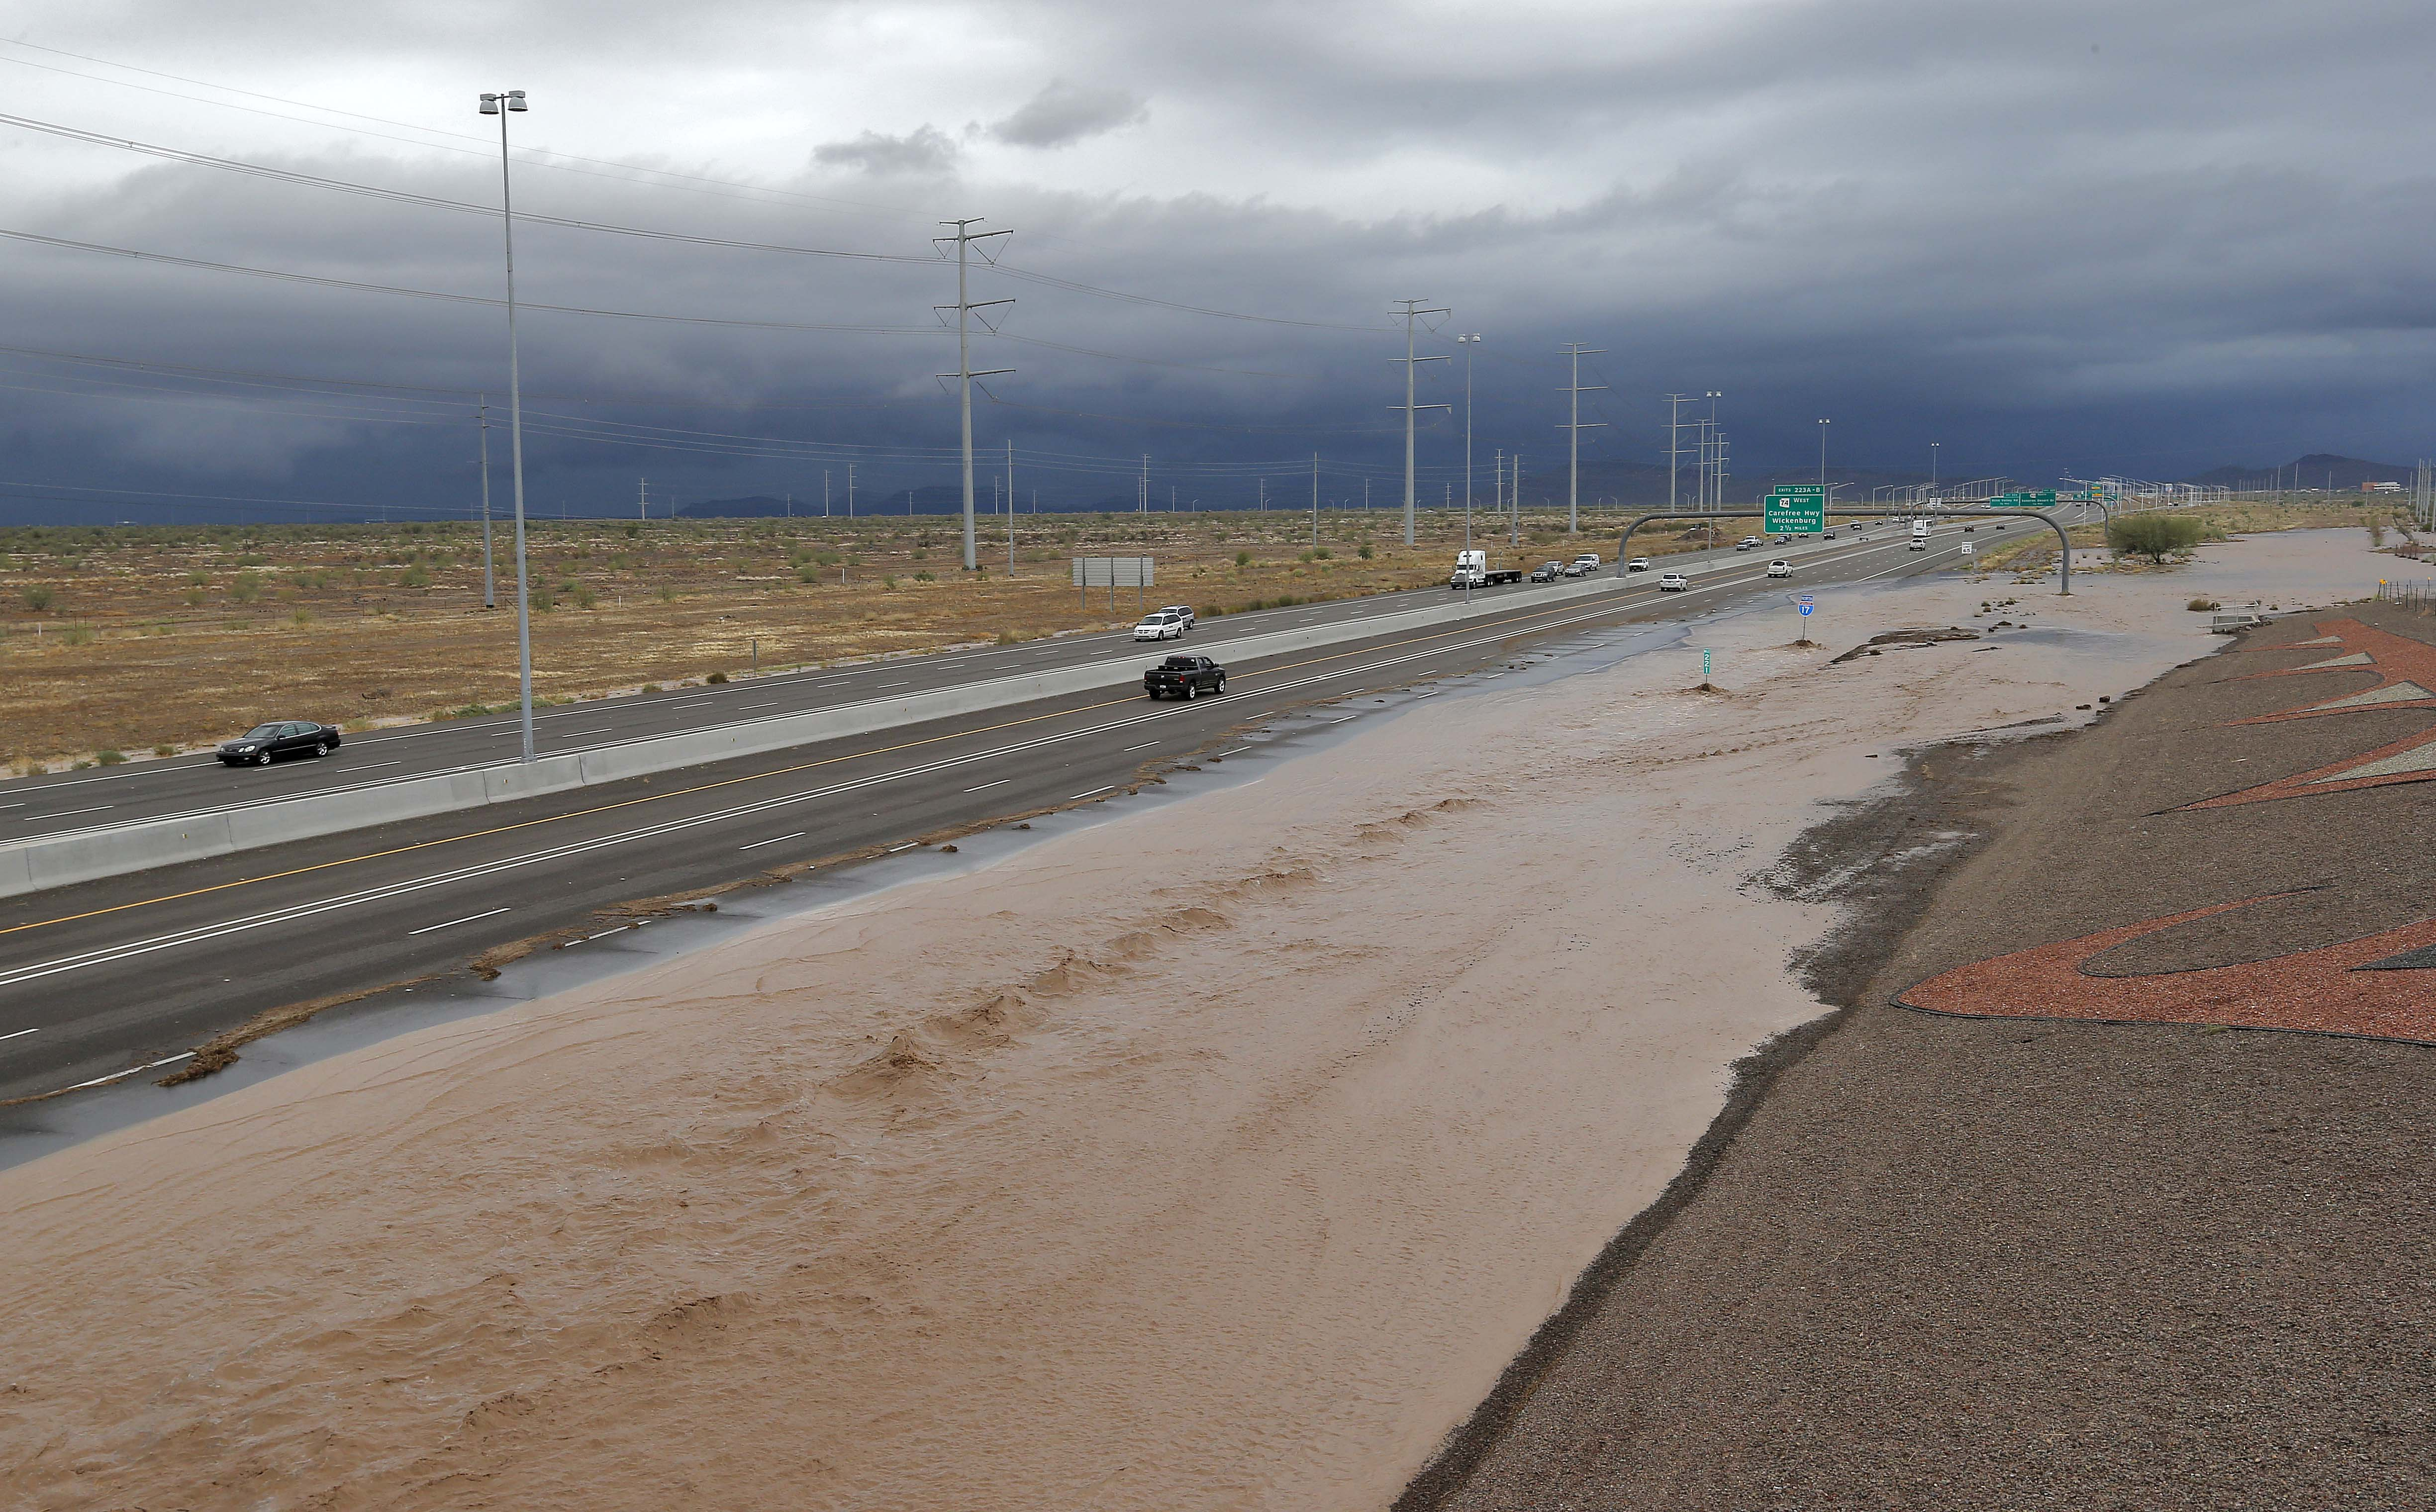 Floodwaters that overran Skunk Creek flood I-10, Aug. 19, 2014, in northwestern Phoenix.